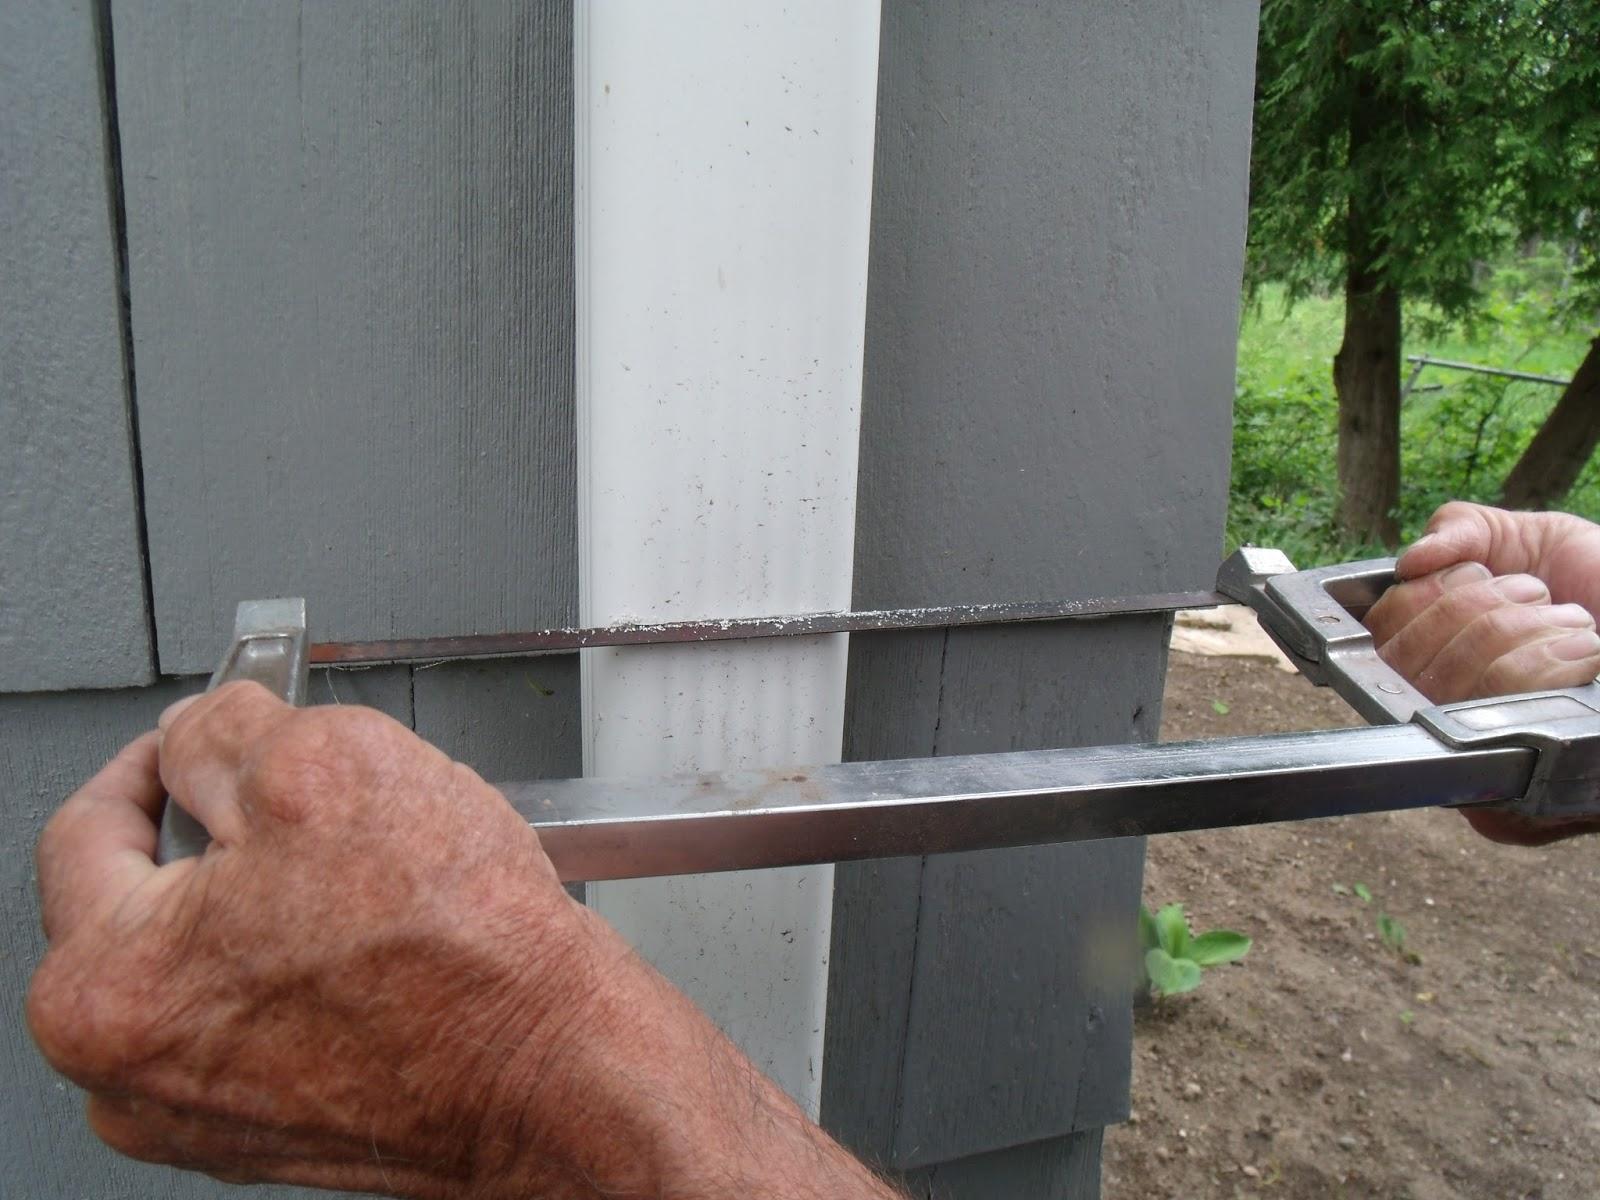 Gear Acres Diy Downspout Diverter Install For The Rain Barrel